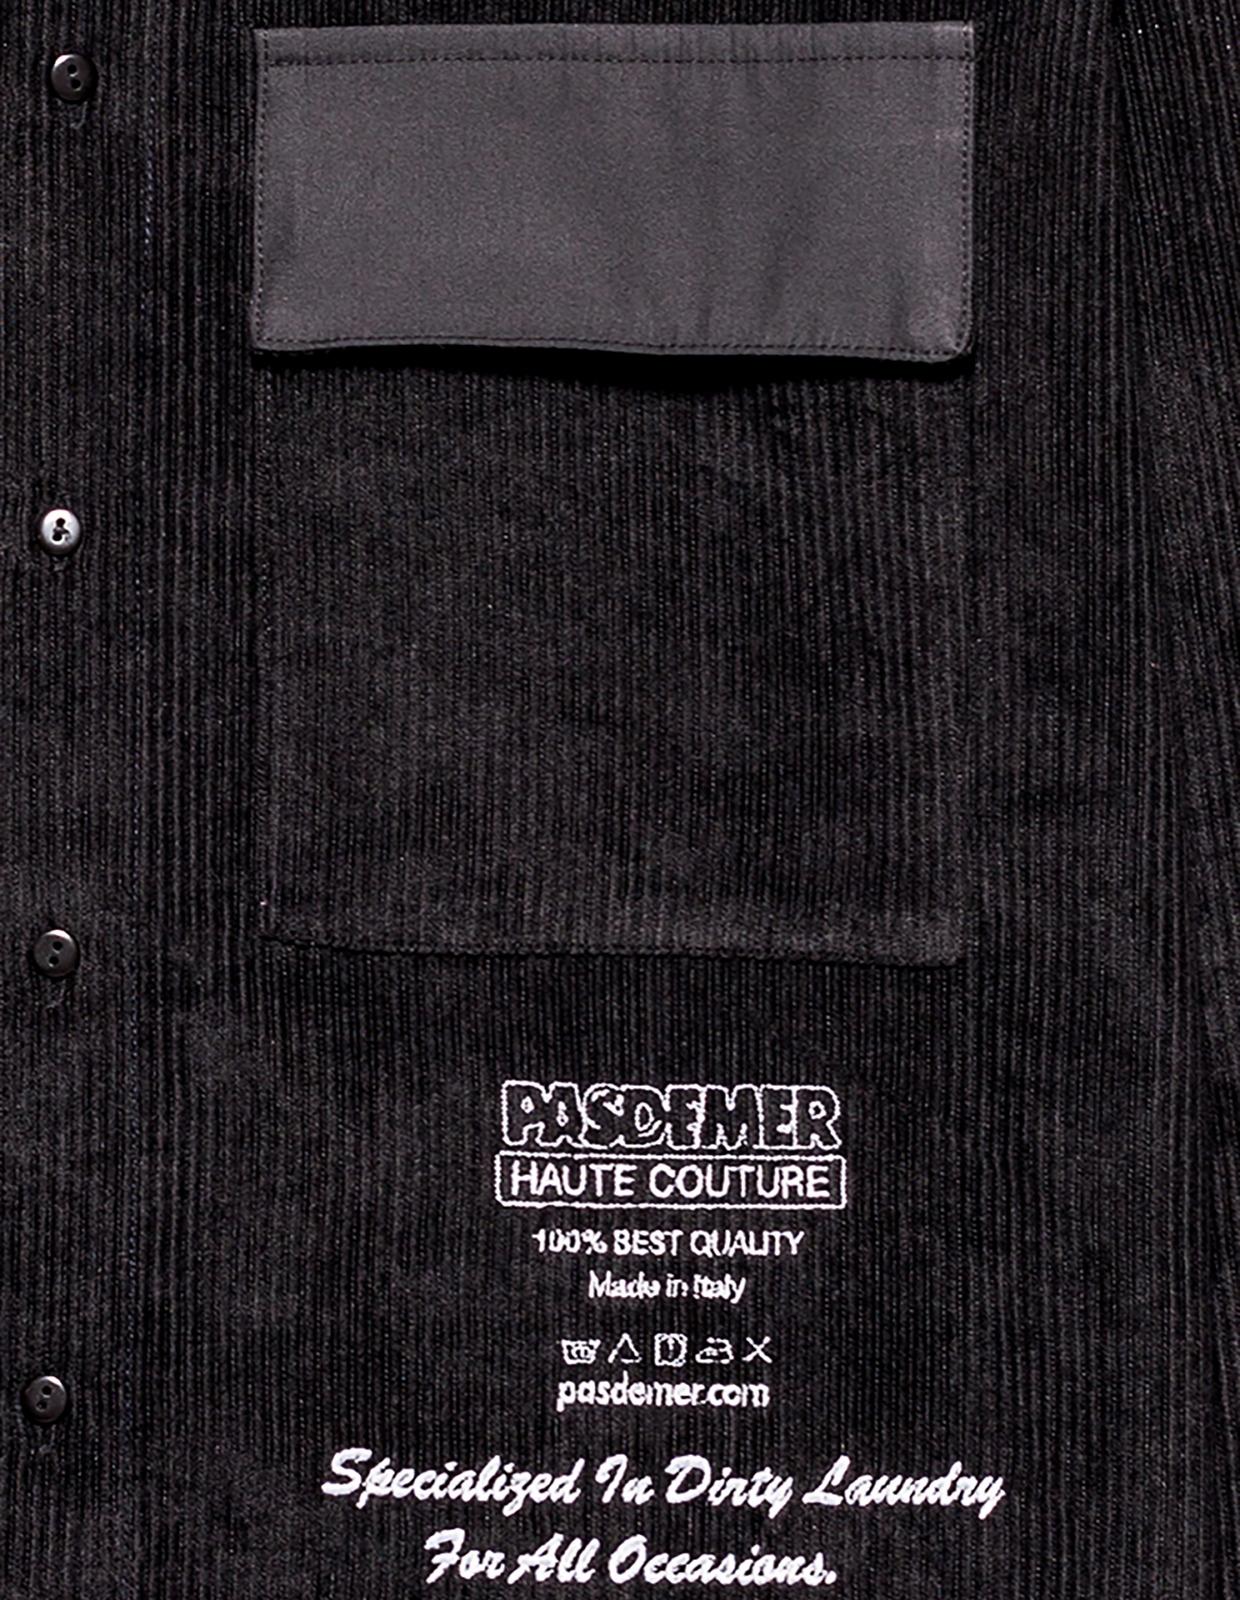 【PAS DE MER/パドゥメ】HAUTE COUTURE SHIRT 長袖シャツ / BLACK